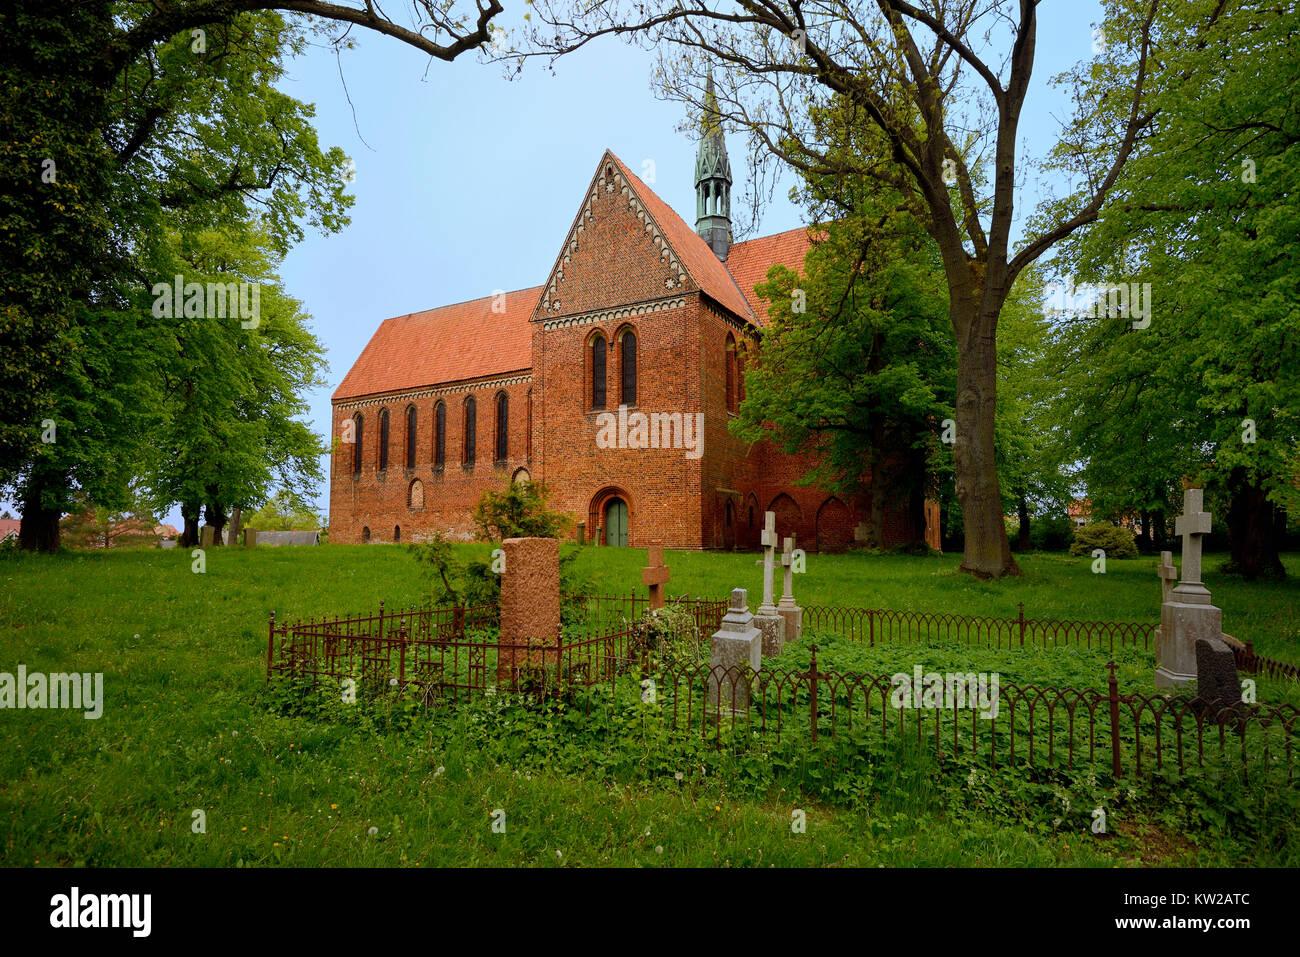 New cloister, new cloister minster, Neukloster, Neukloster Klosterkirche - Stock Image